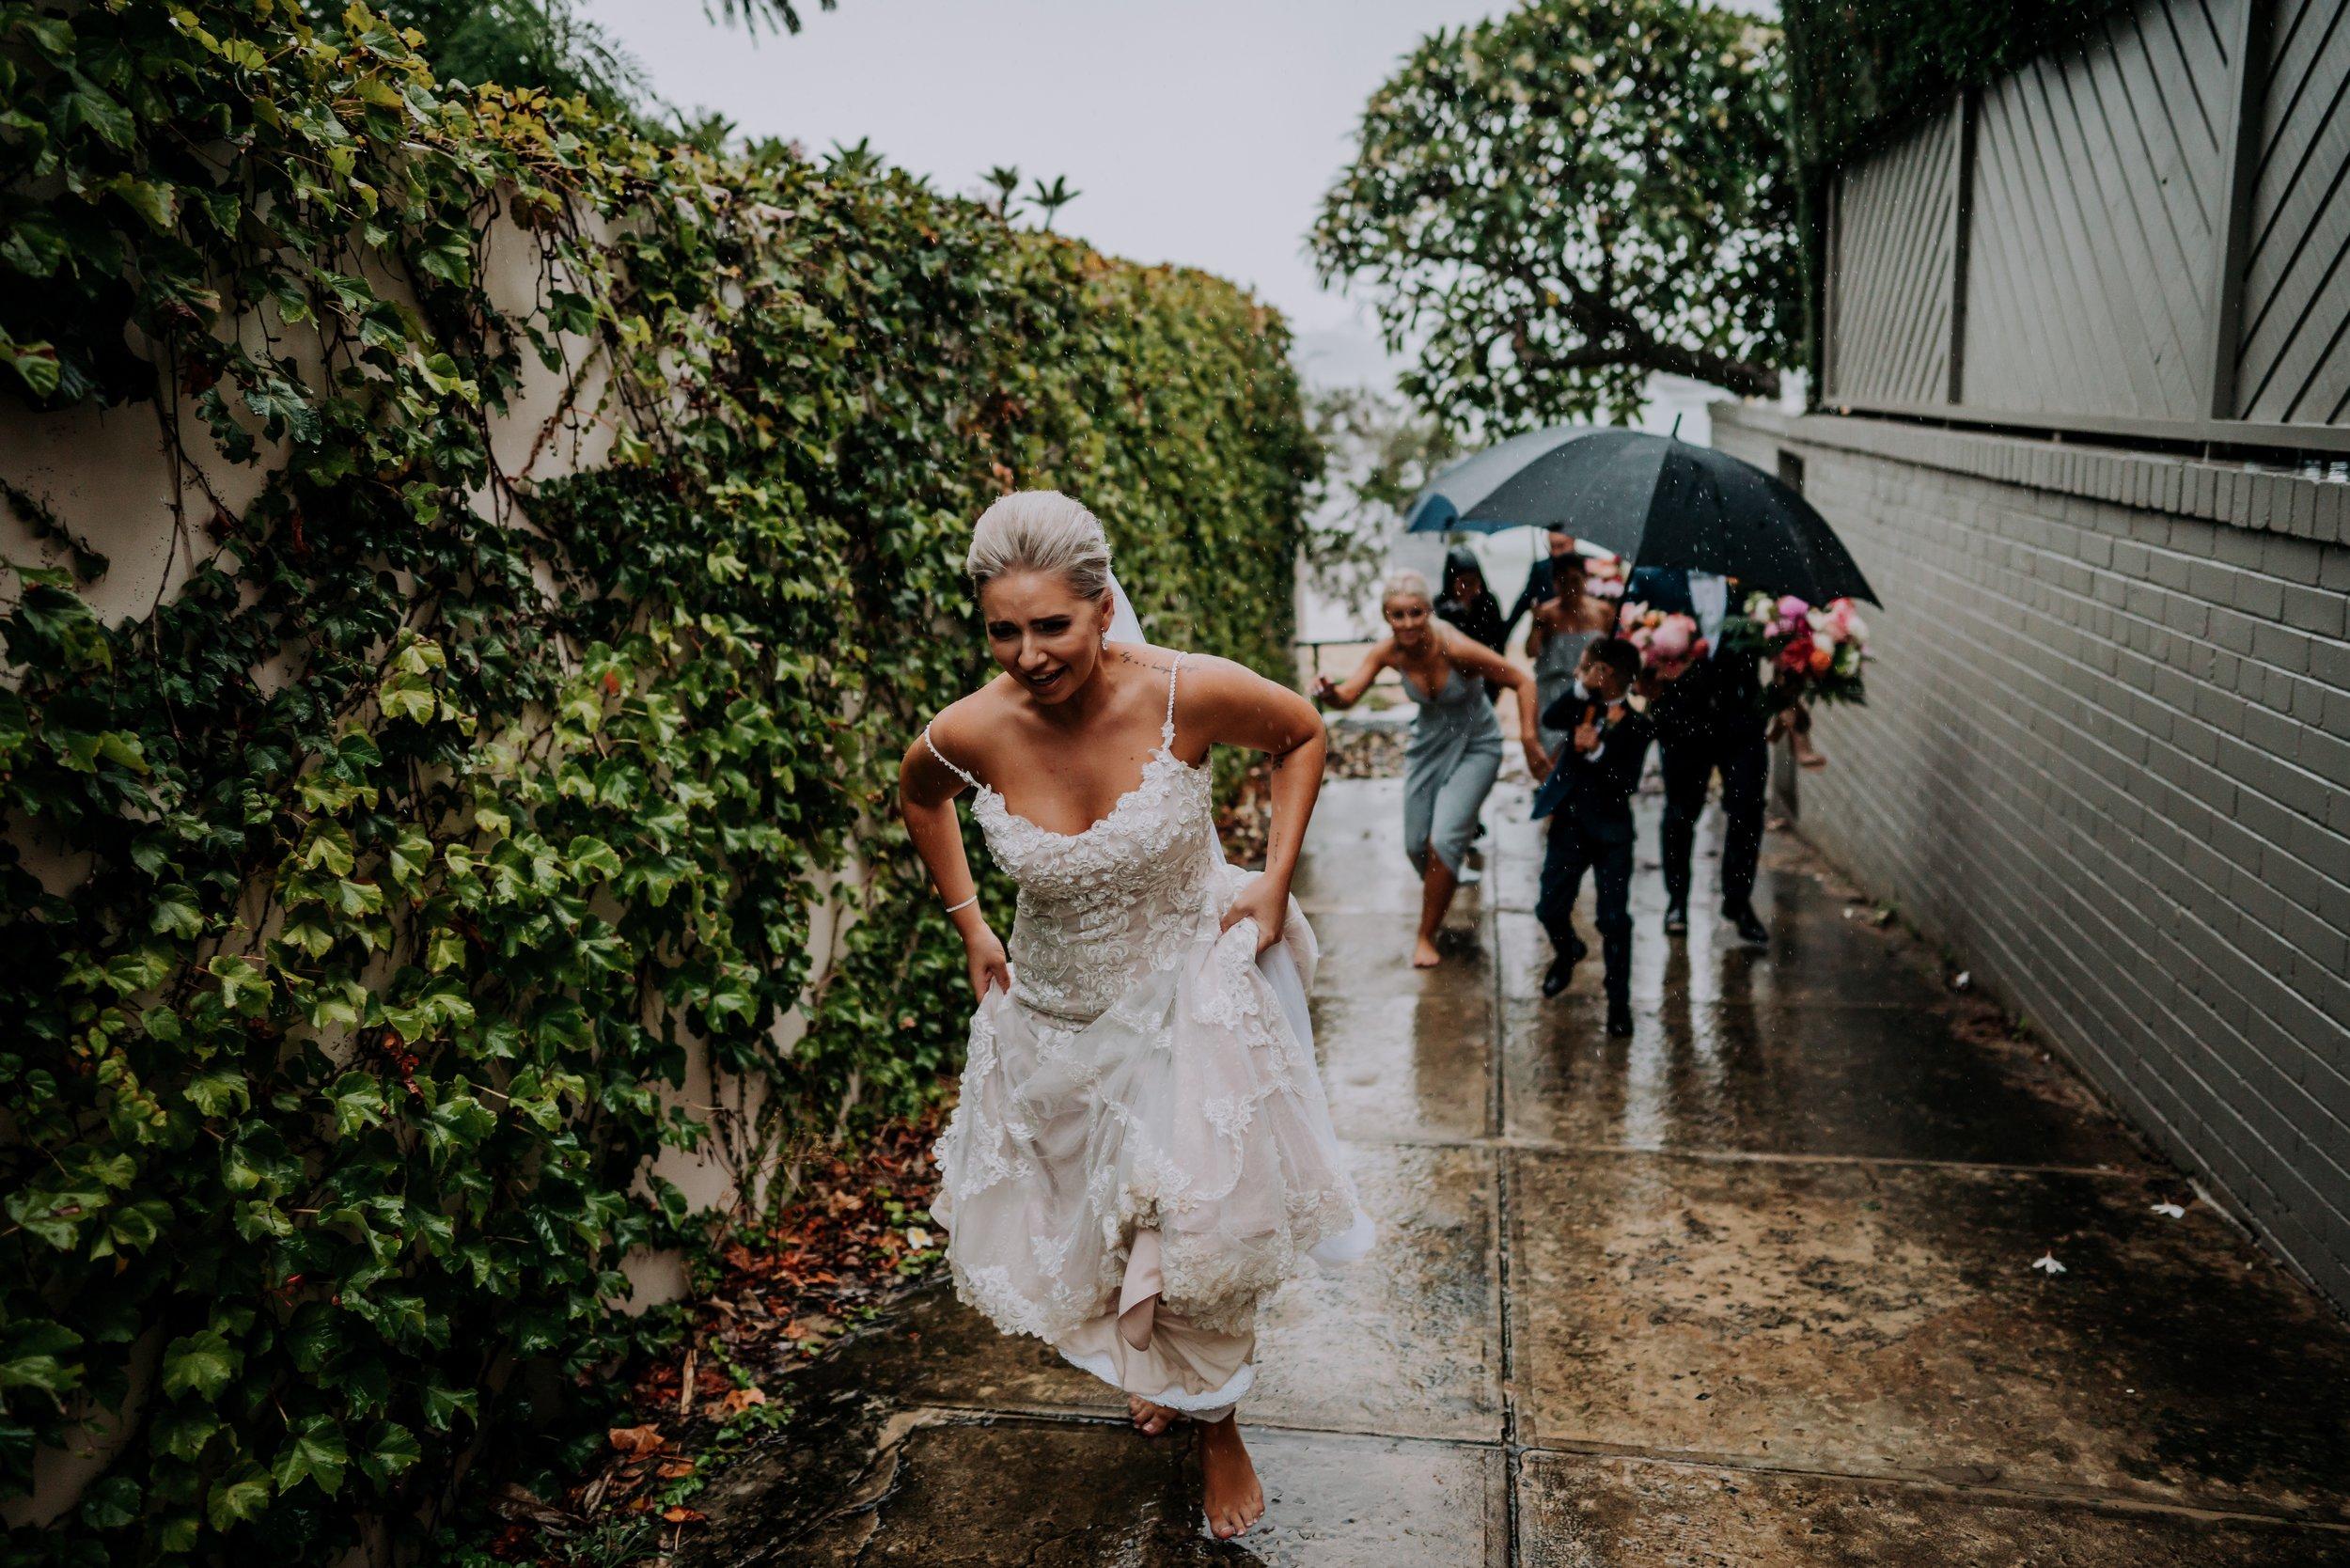 ava-me-photography-gemma-brent-zest-point-piper-sydney-wedding-429.jpg